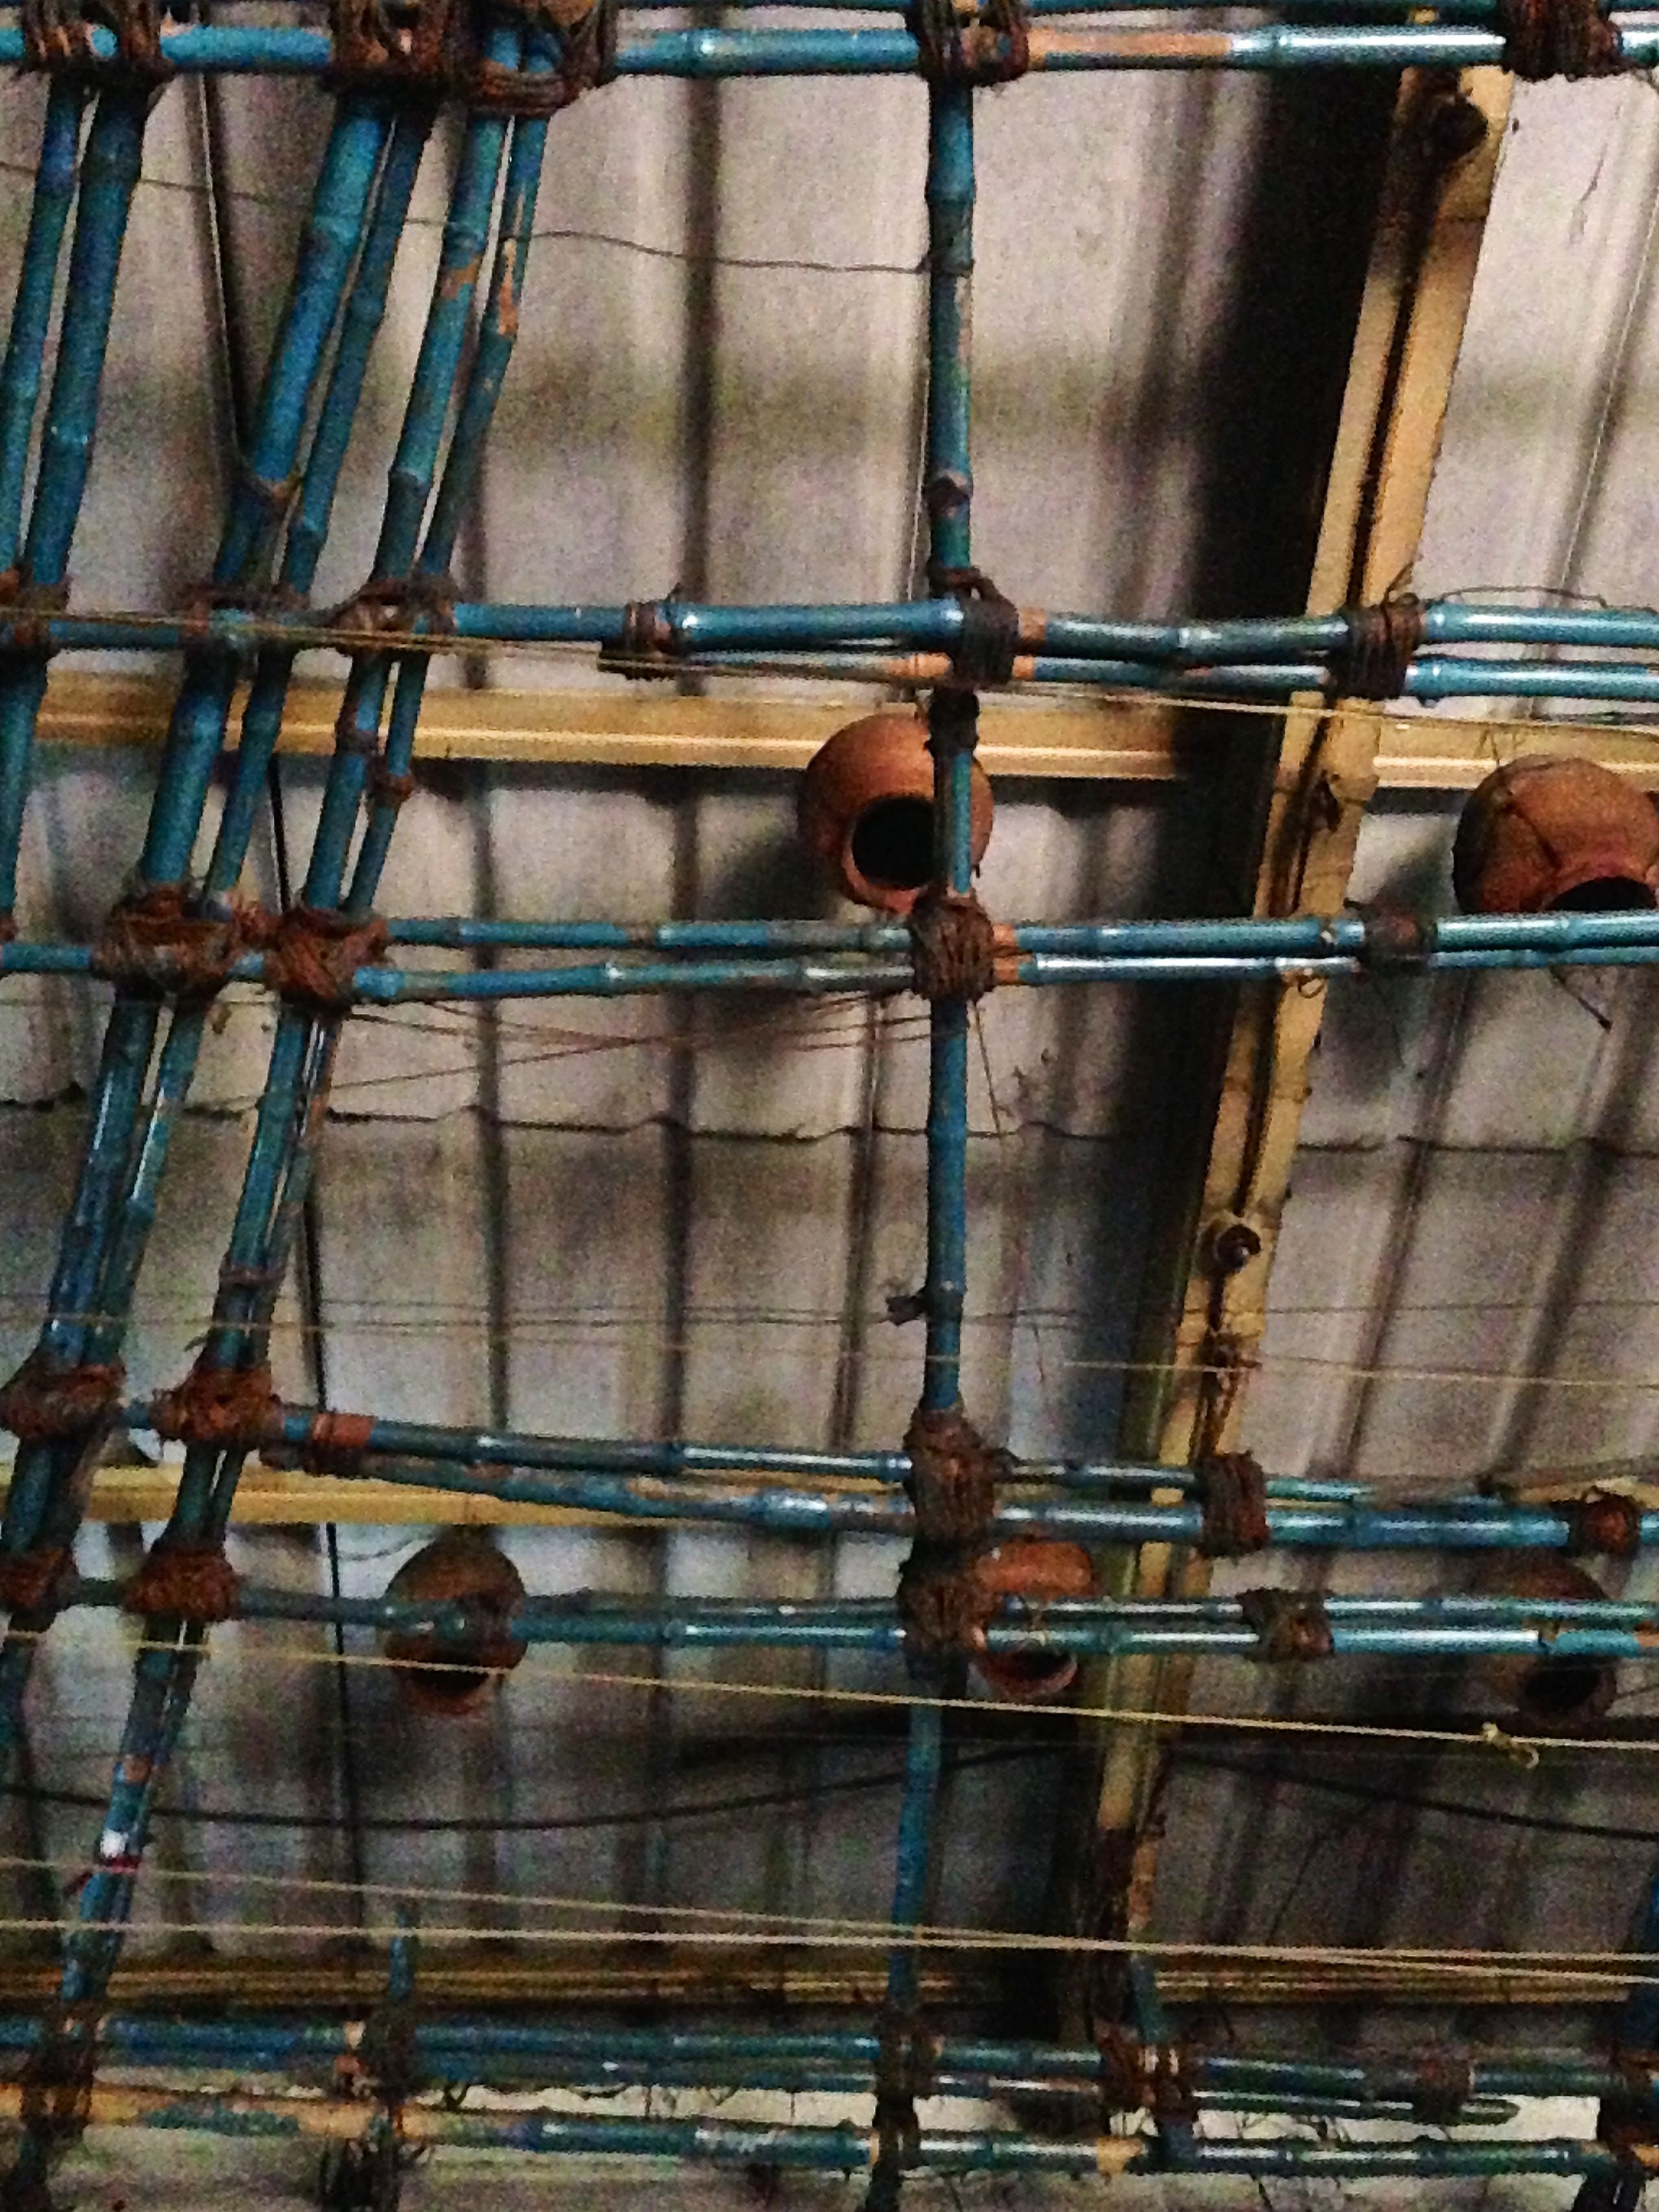 Pots in the rafters, Kolkata 2014. Maya Bhalla